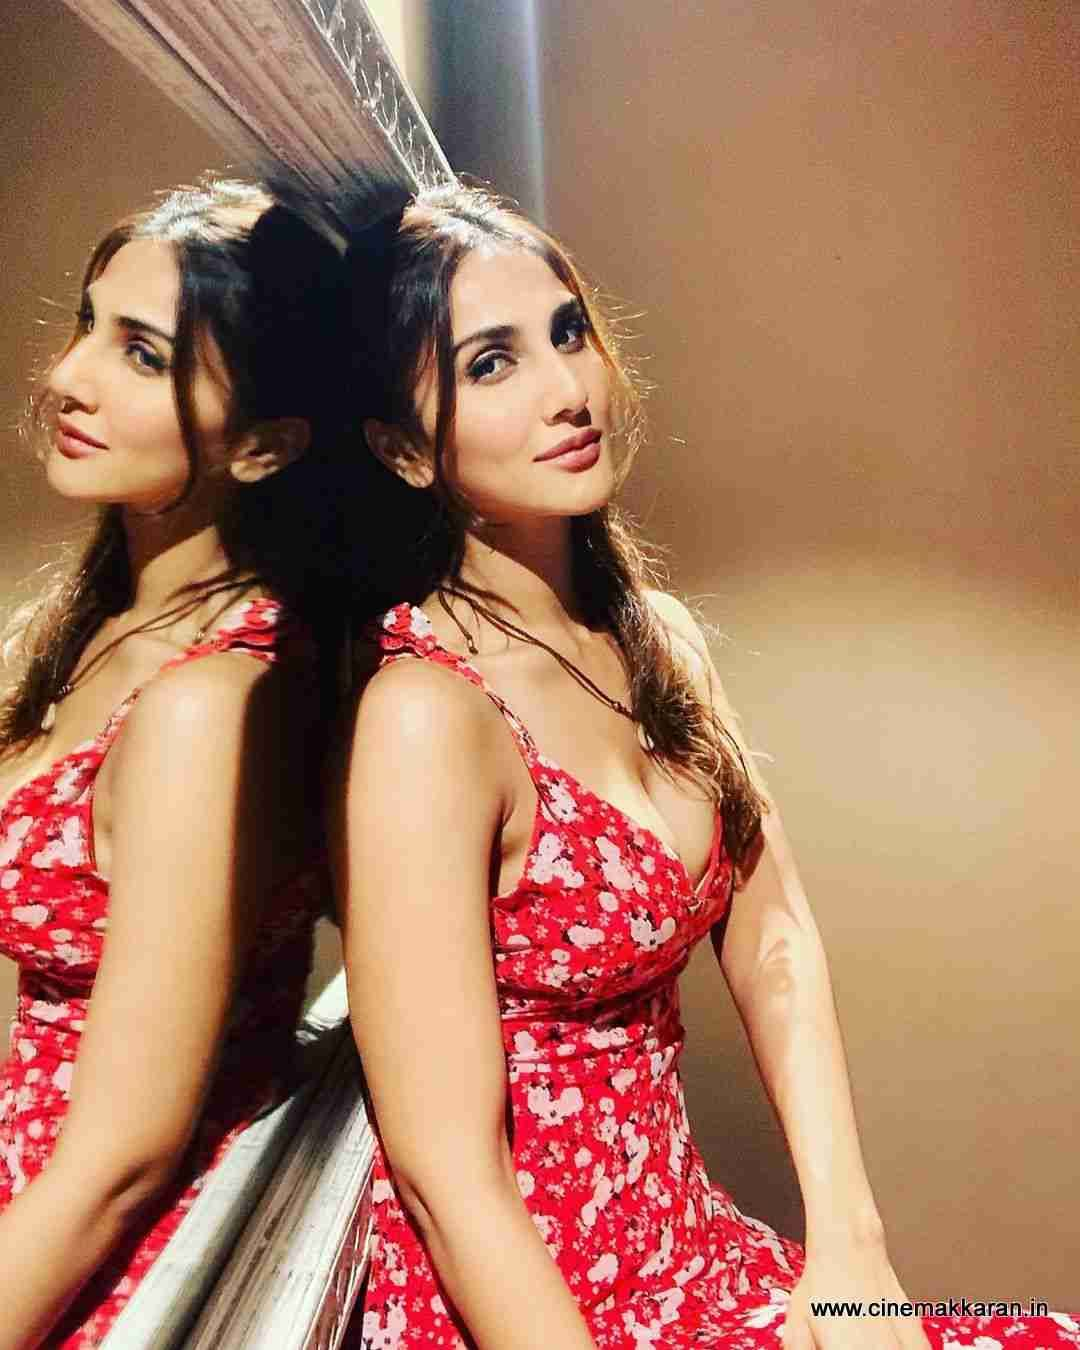 Vaani Kapoor Photos Cinemakkaran Bollywood Actress Hot Photos Bollywood Actress Hot Bollywood Actress